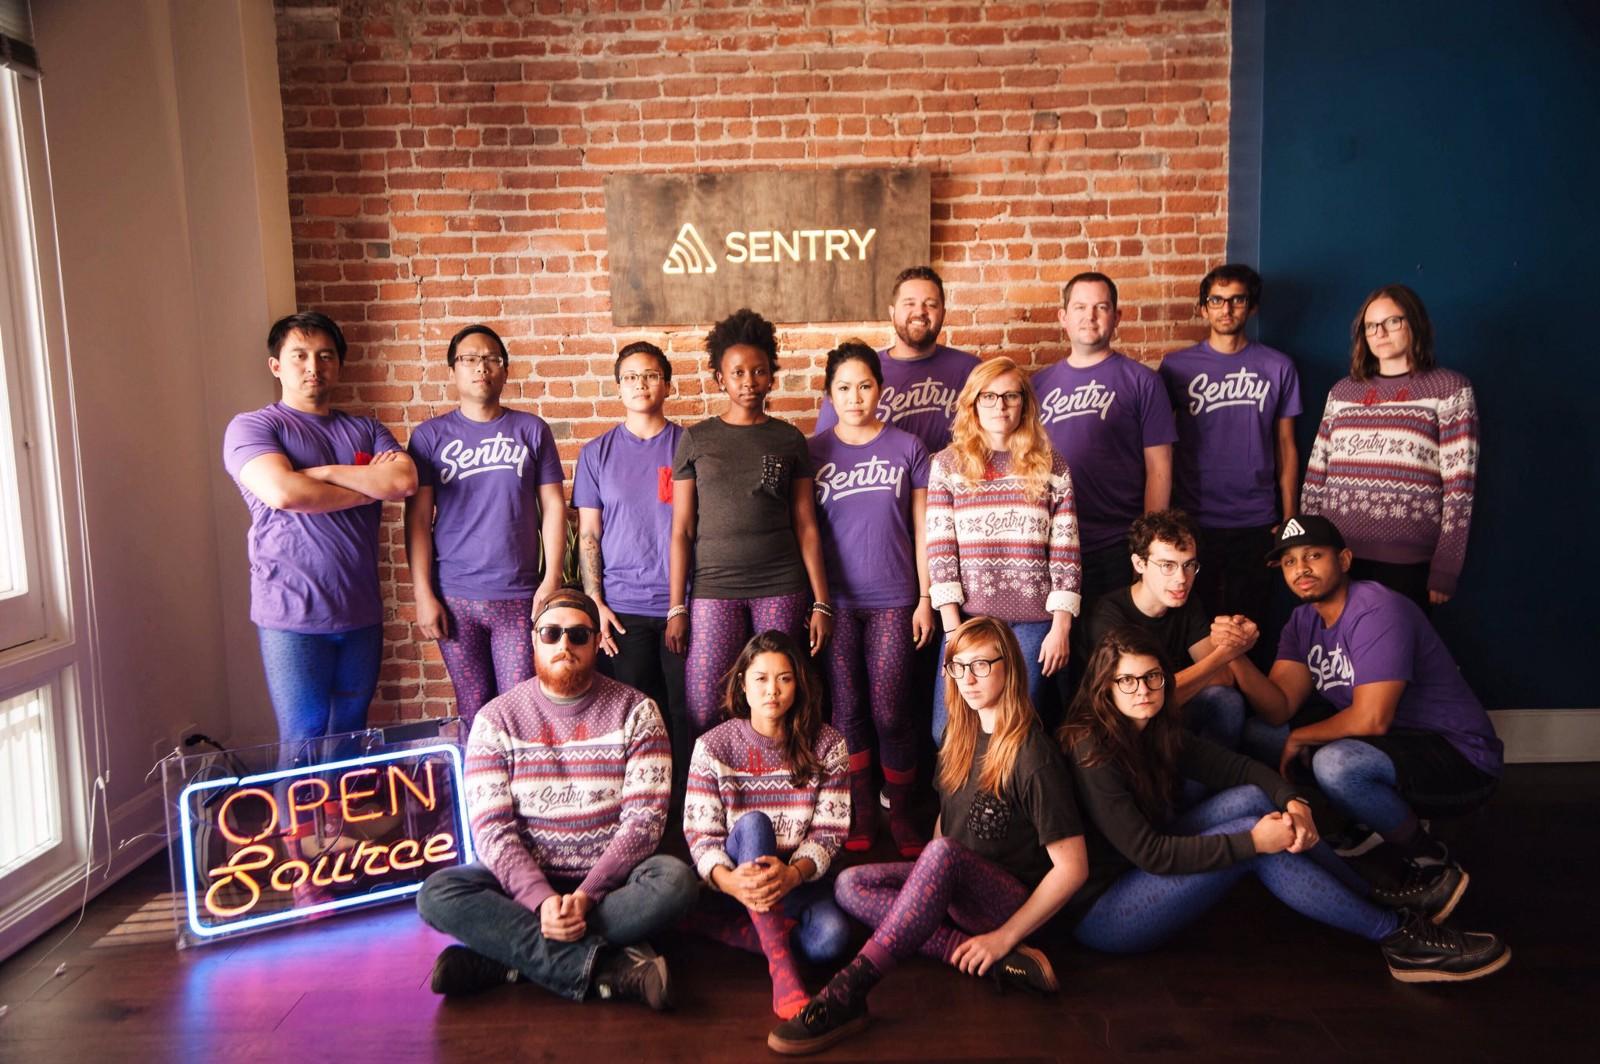 Sentry team photo